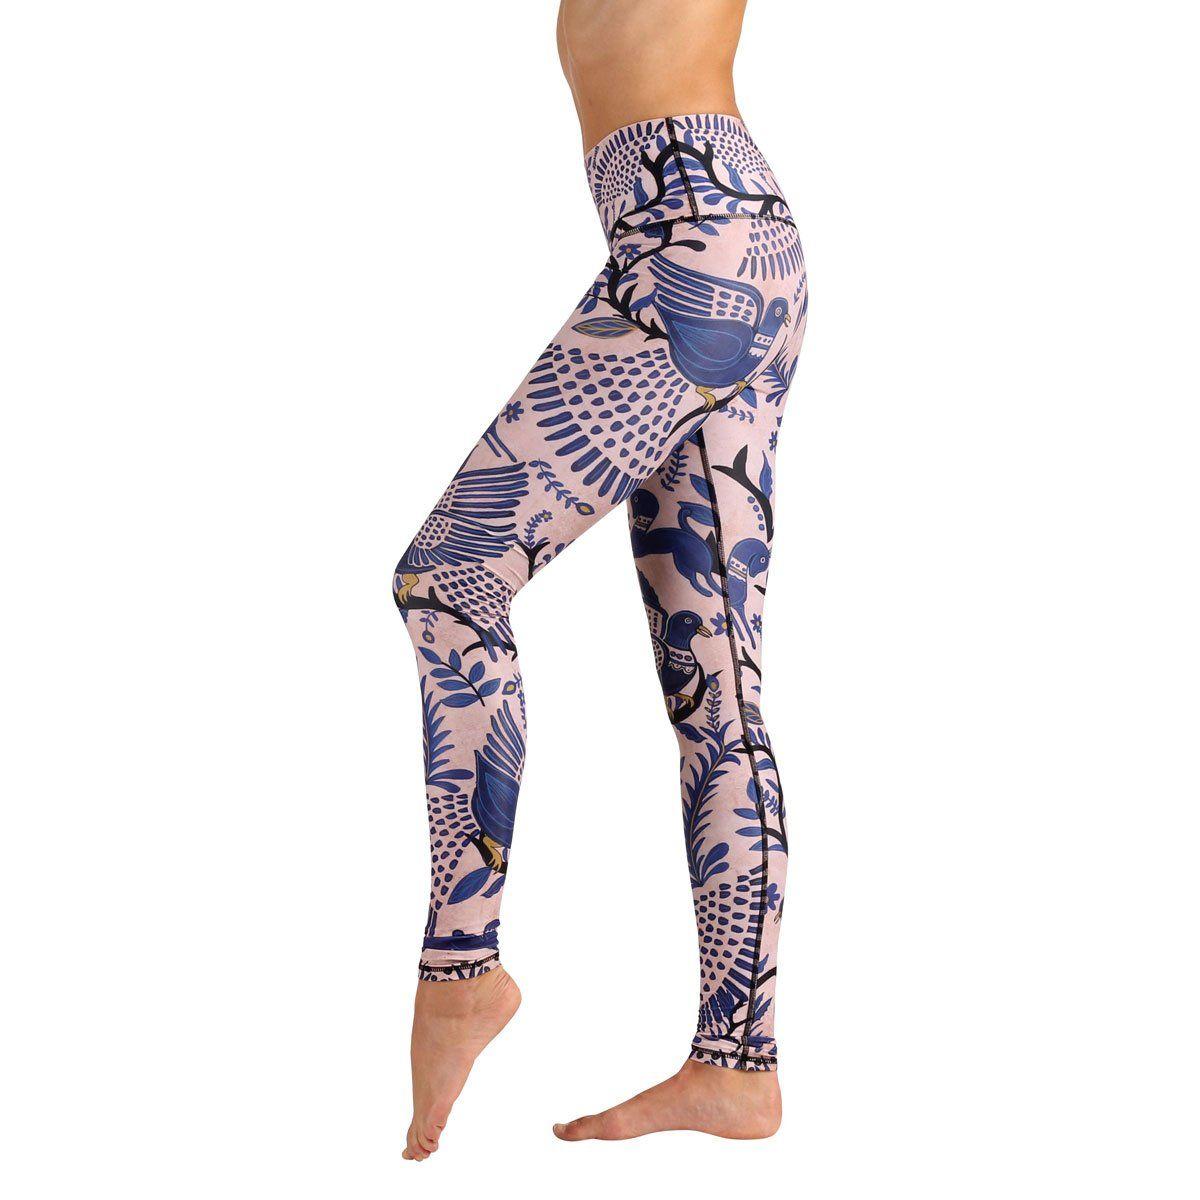 faa0302150 Flux Legging - Thunder | My Style | Yoga wear, Leggings are not pants,  Fashion